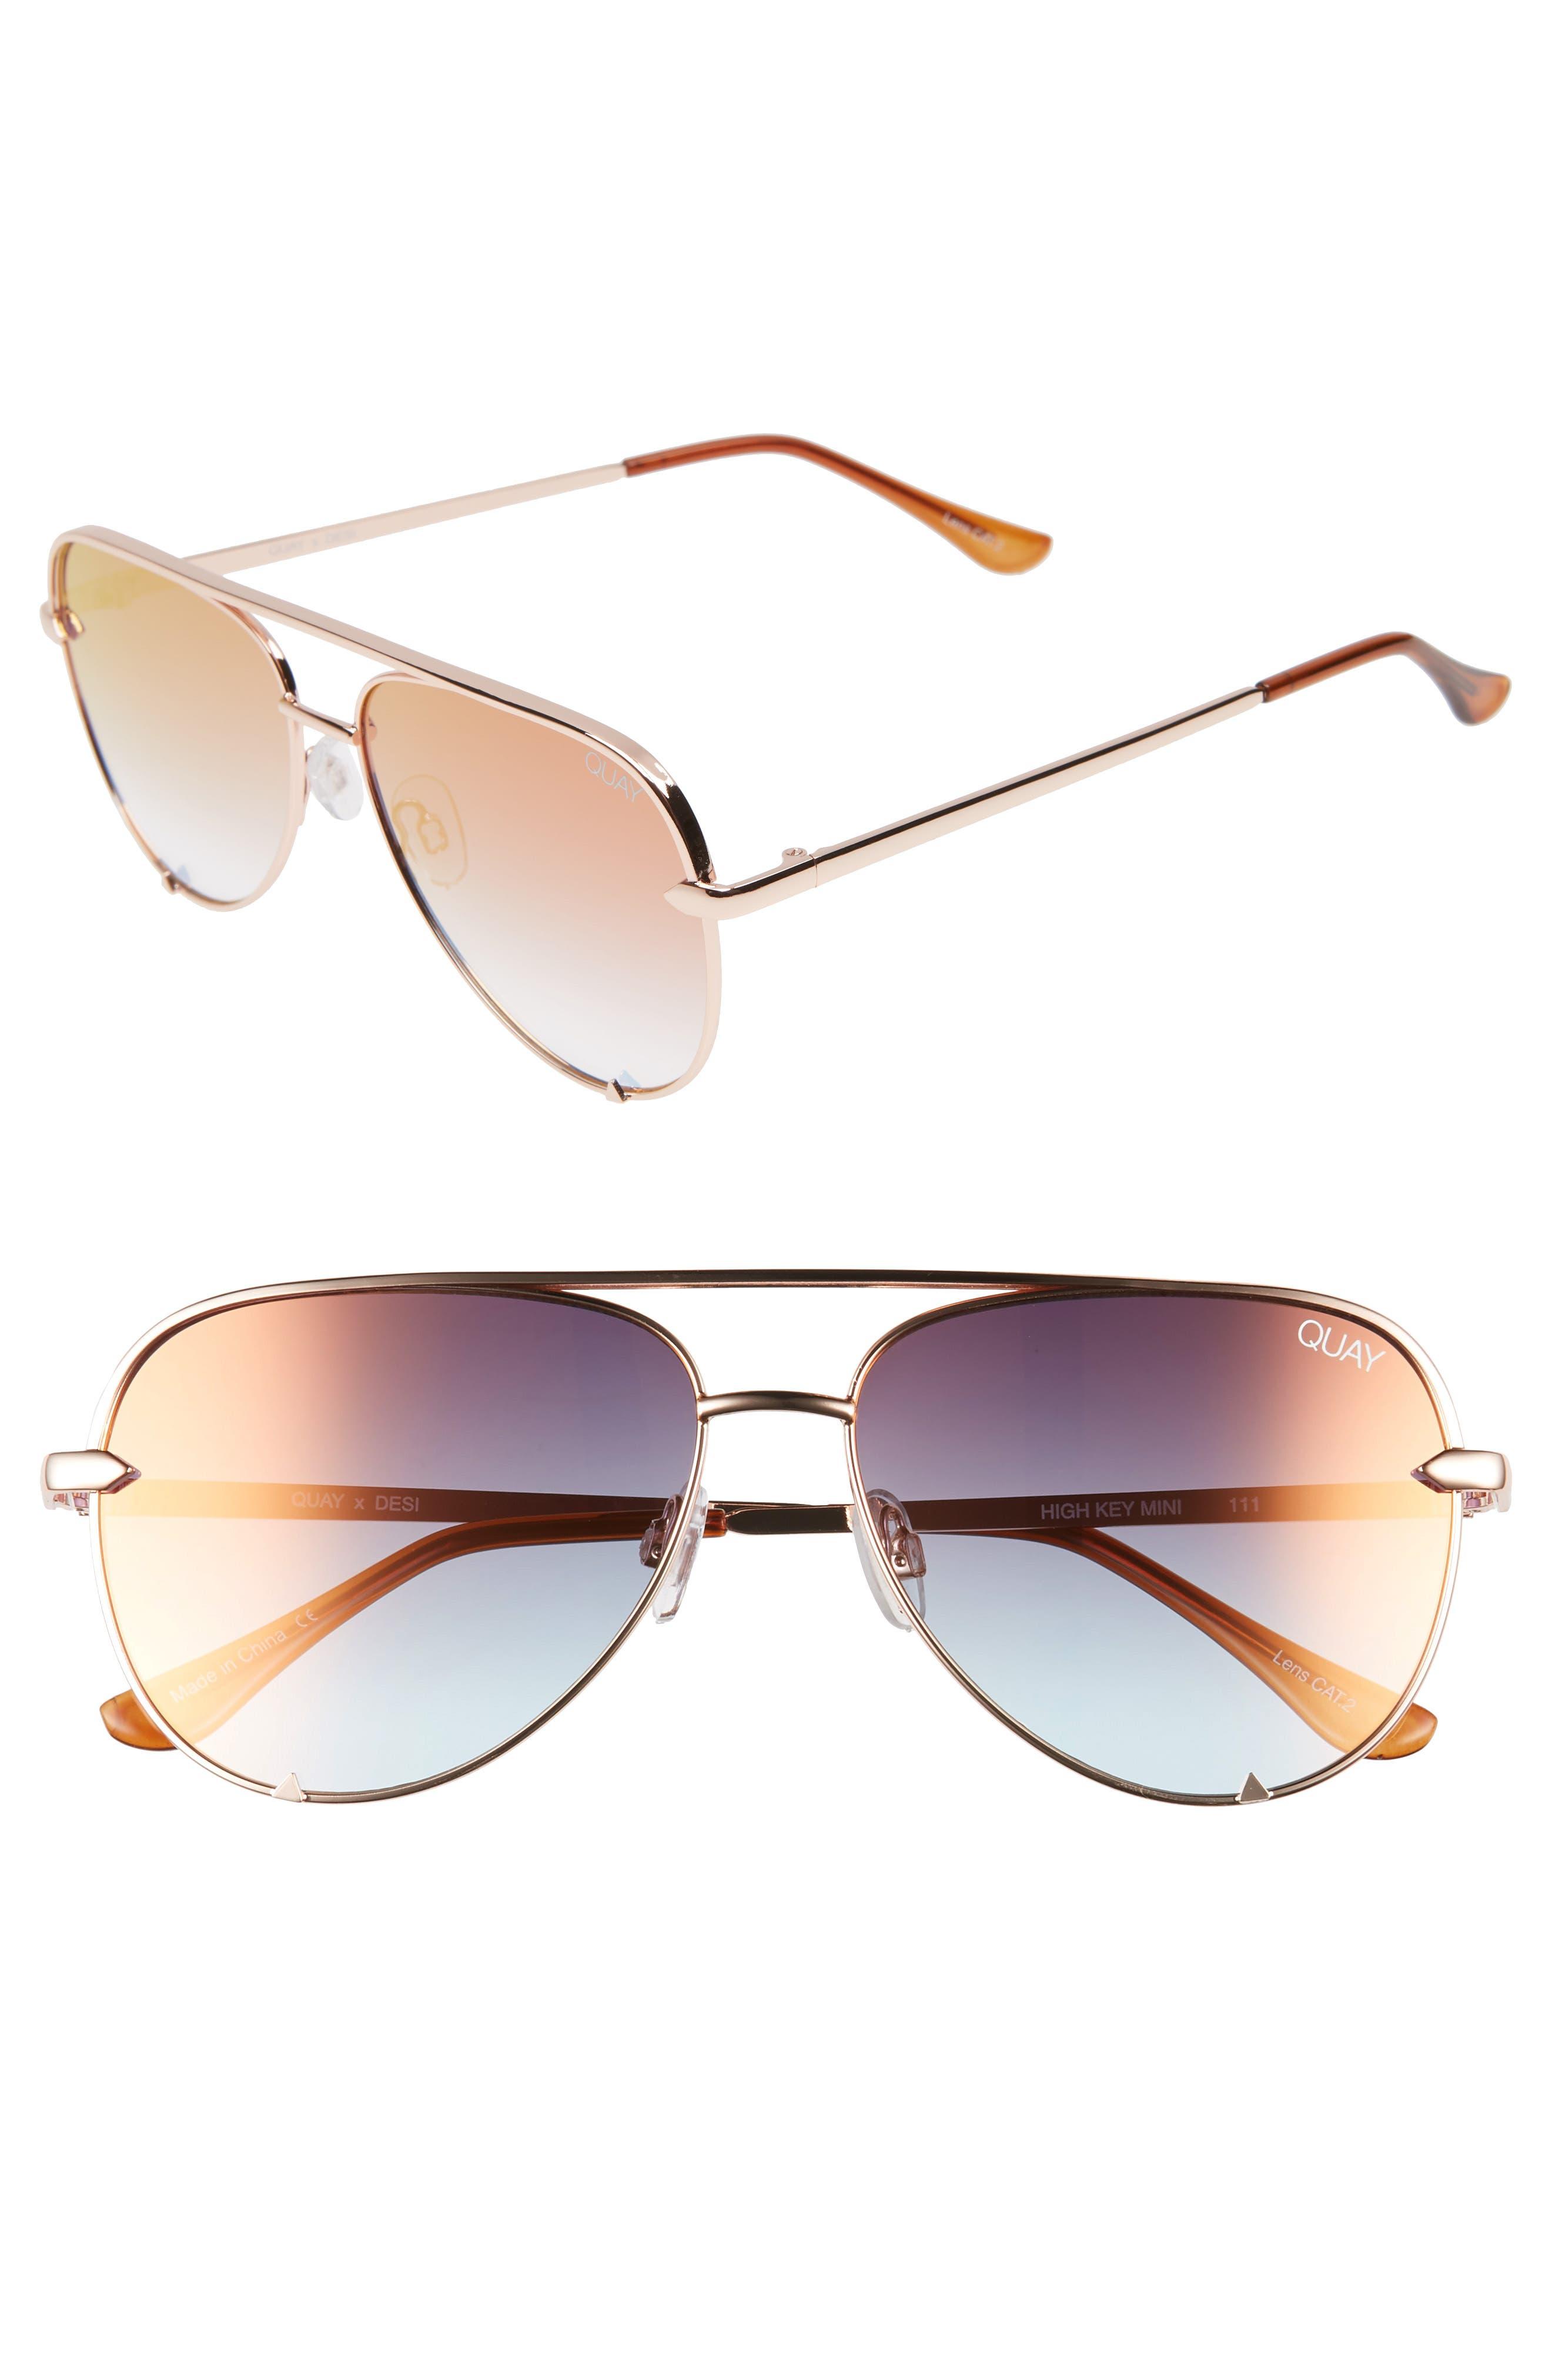 QUAY AUSTRALIA x Desi Perkins High Key Mini 57mm Aviator Sunglasses, Main, color, ROSE/ CPRFD